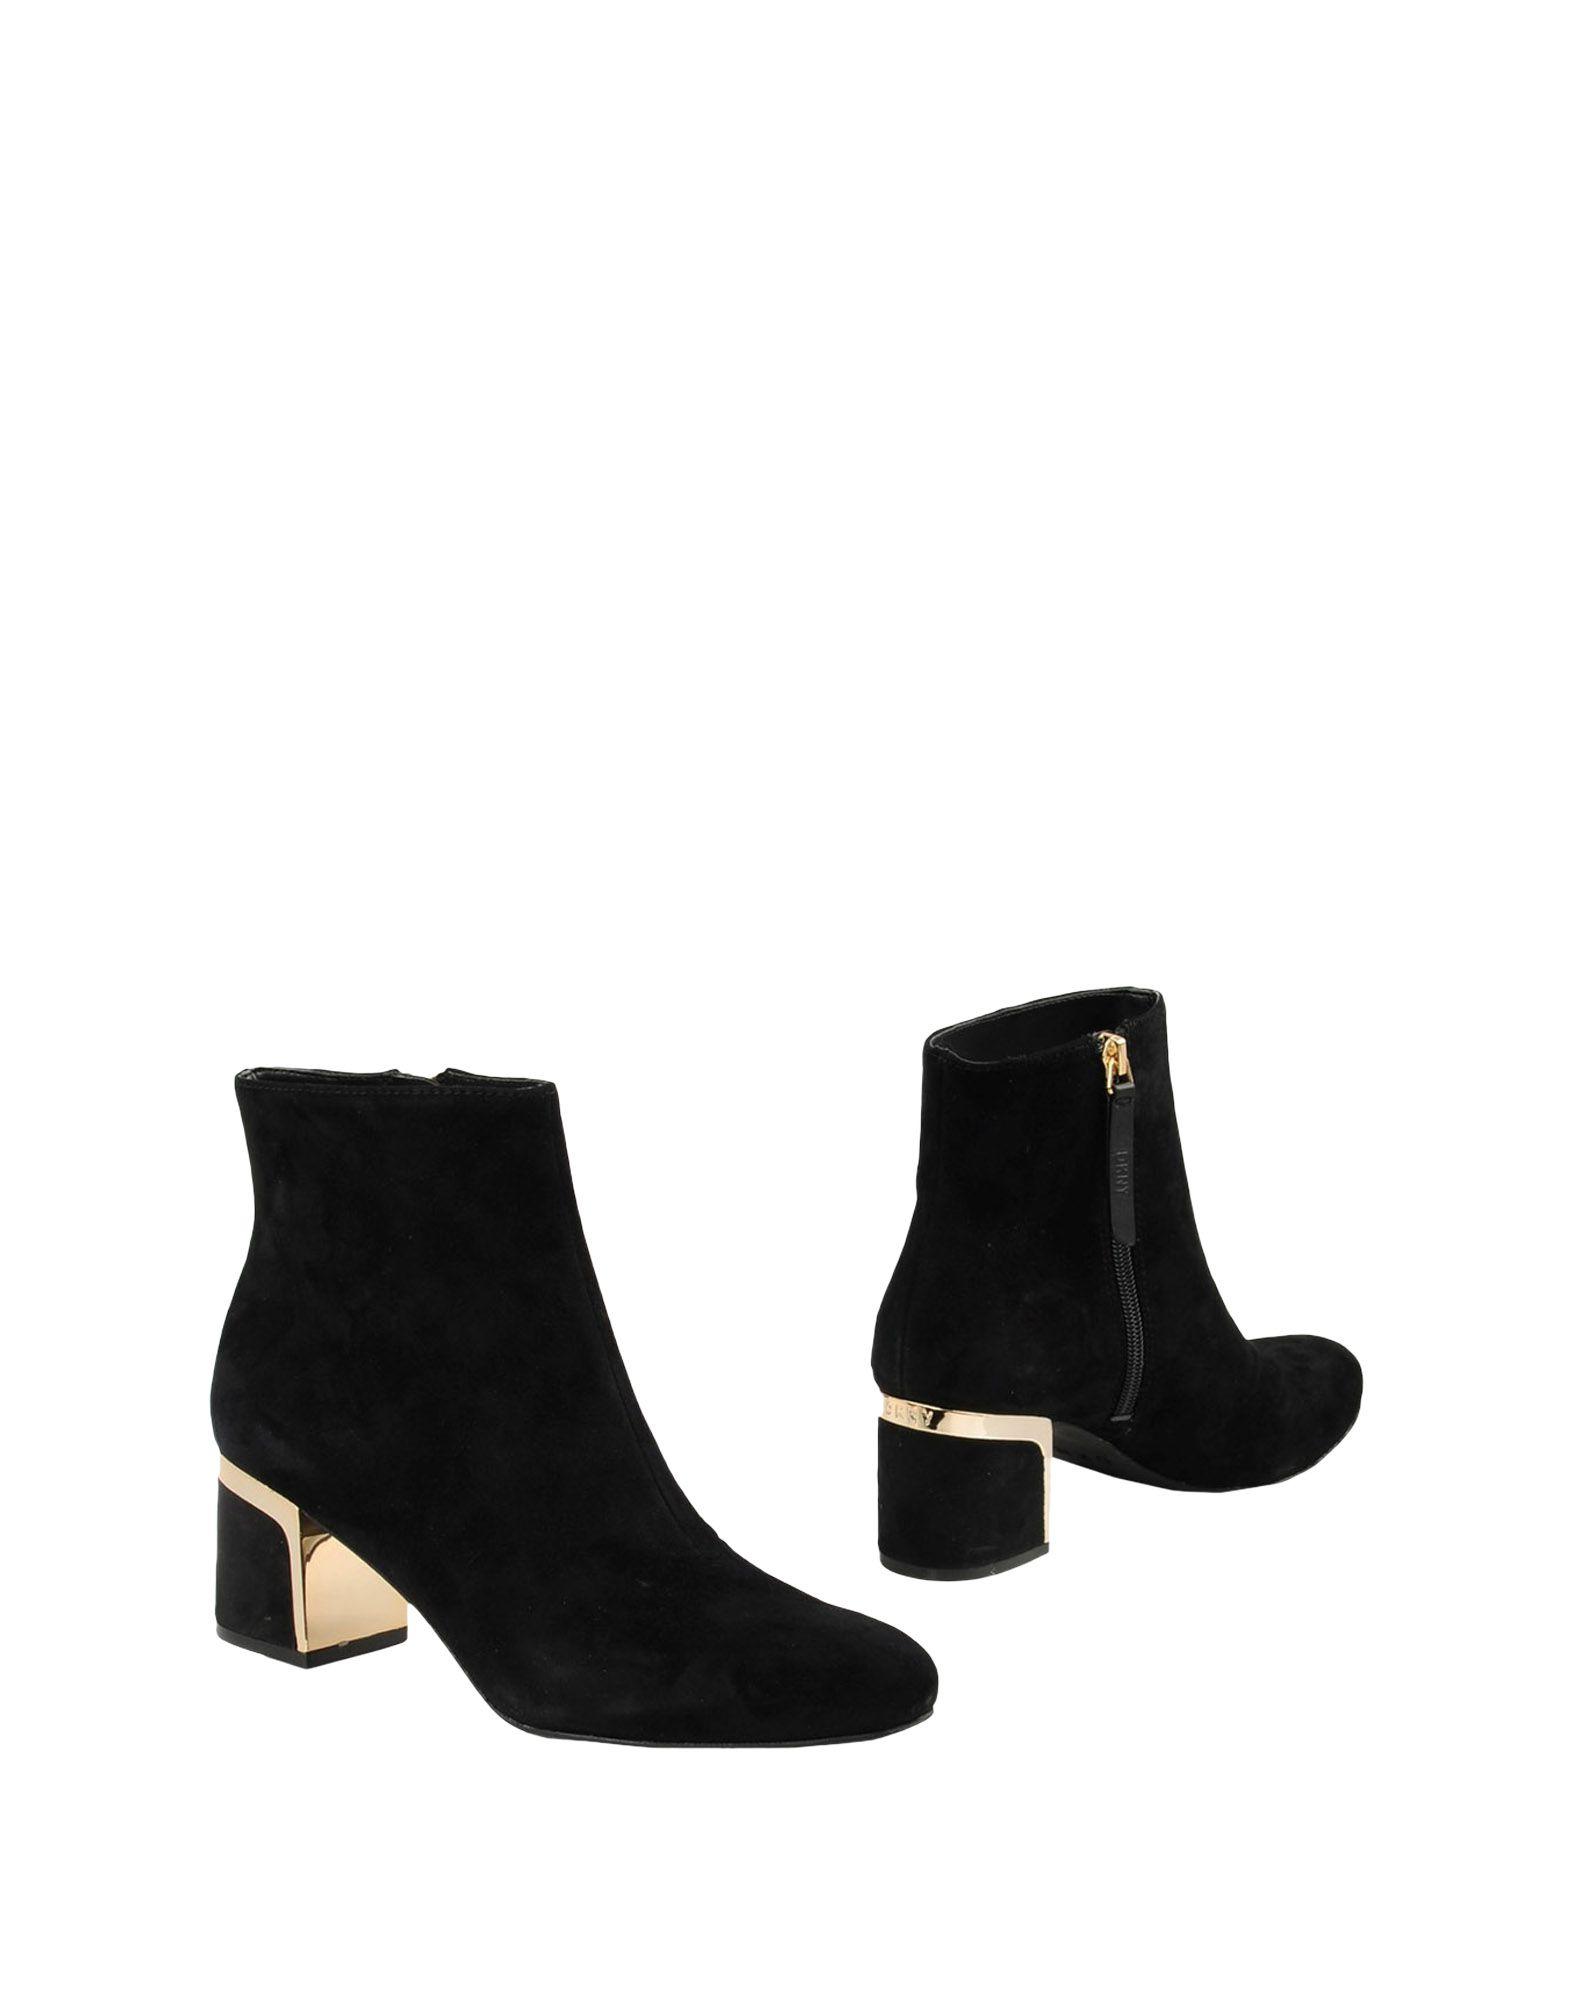 Stivaletti Dkny Corrie Ankle Boot - Donna - 11373216CU